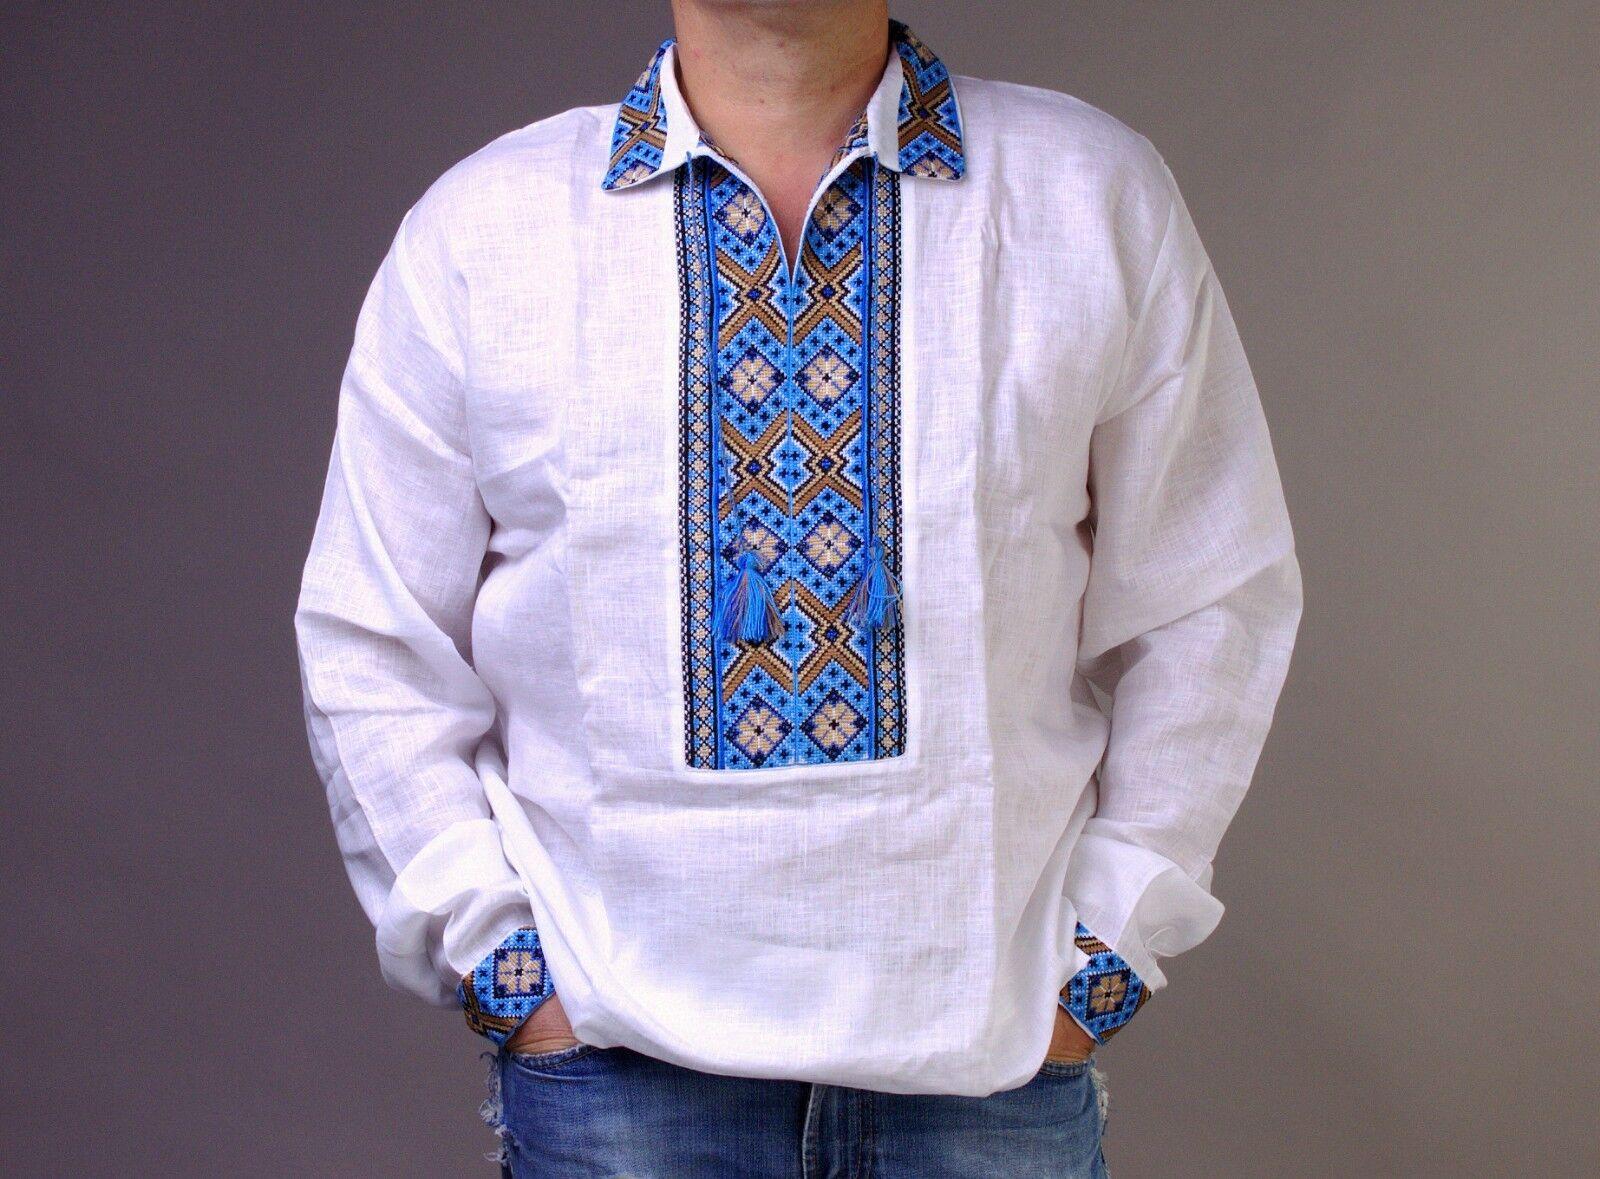 VYSHYVANKA Man Ukraine Embroidery LINEN White bluee shirt Polo collar S-4XL